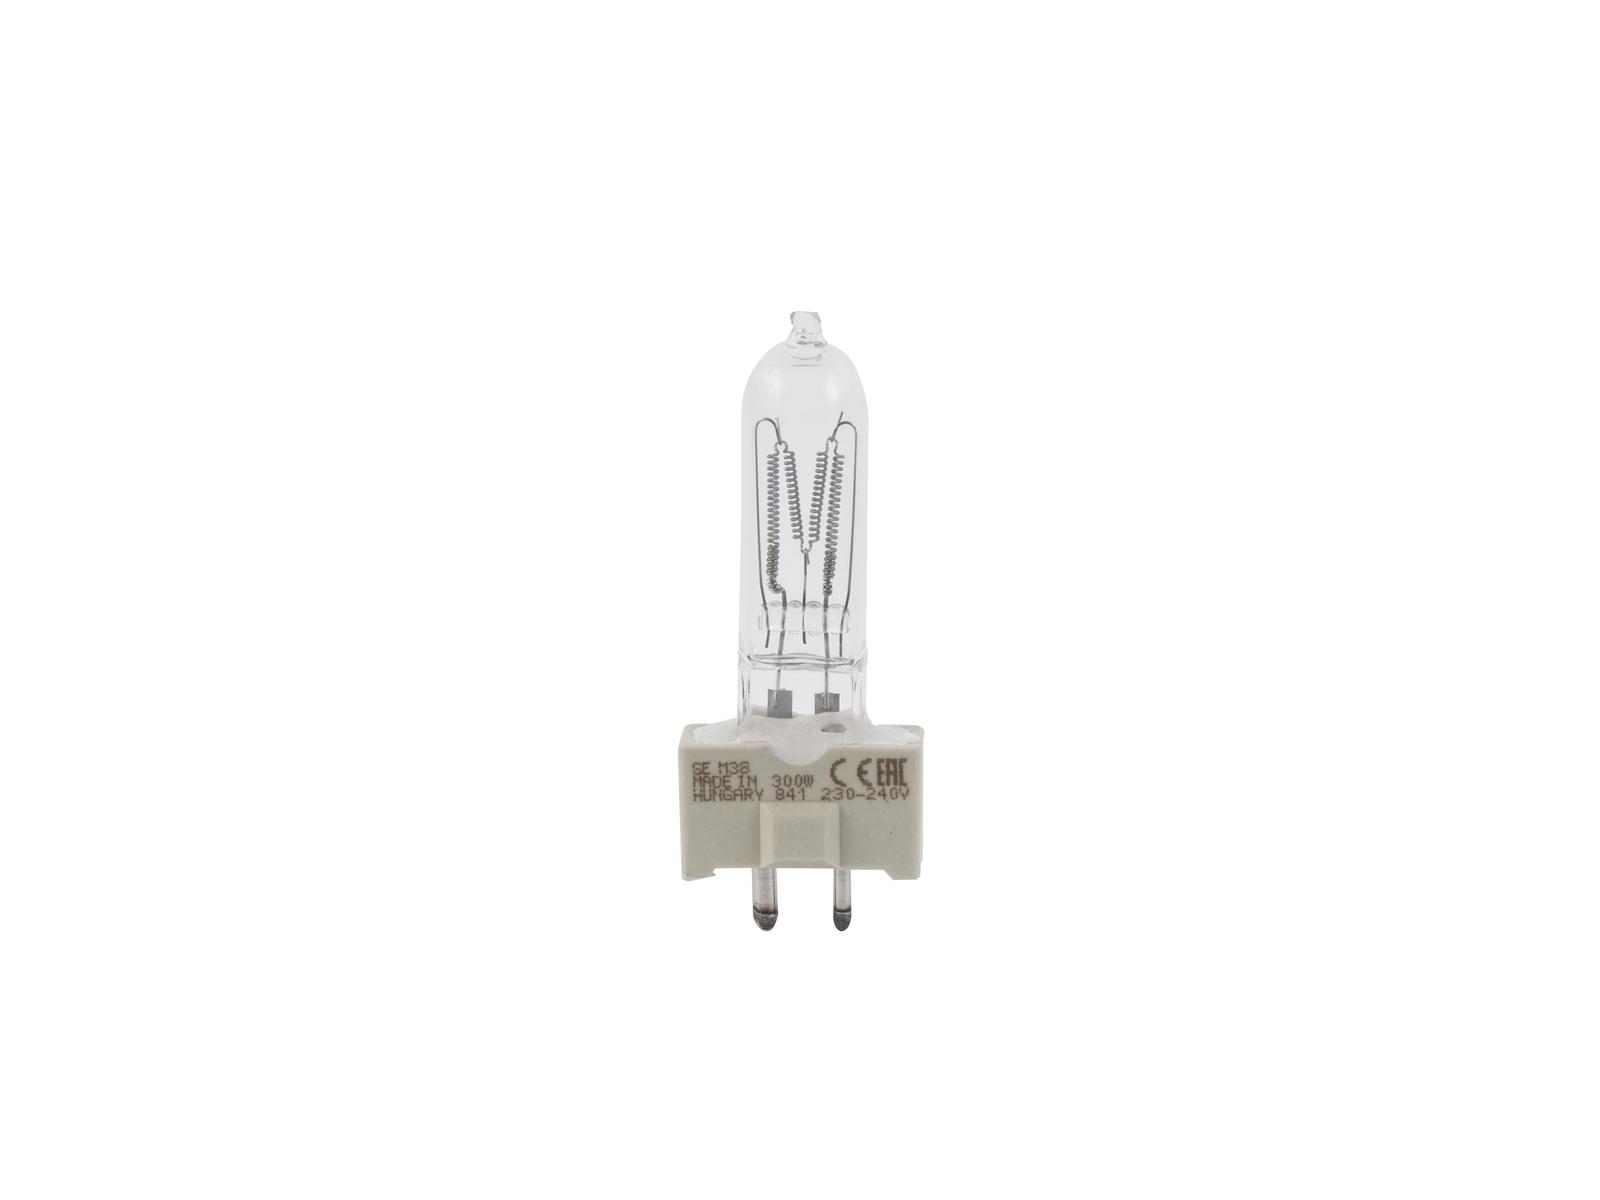 GE CP81 FSK 240V/300W GY-9,5 150h 3200K